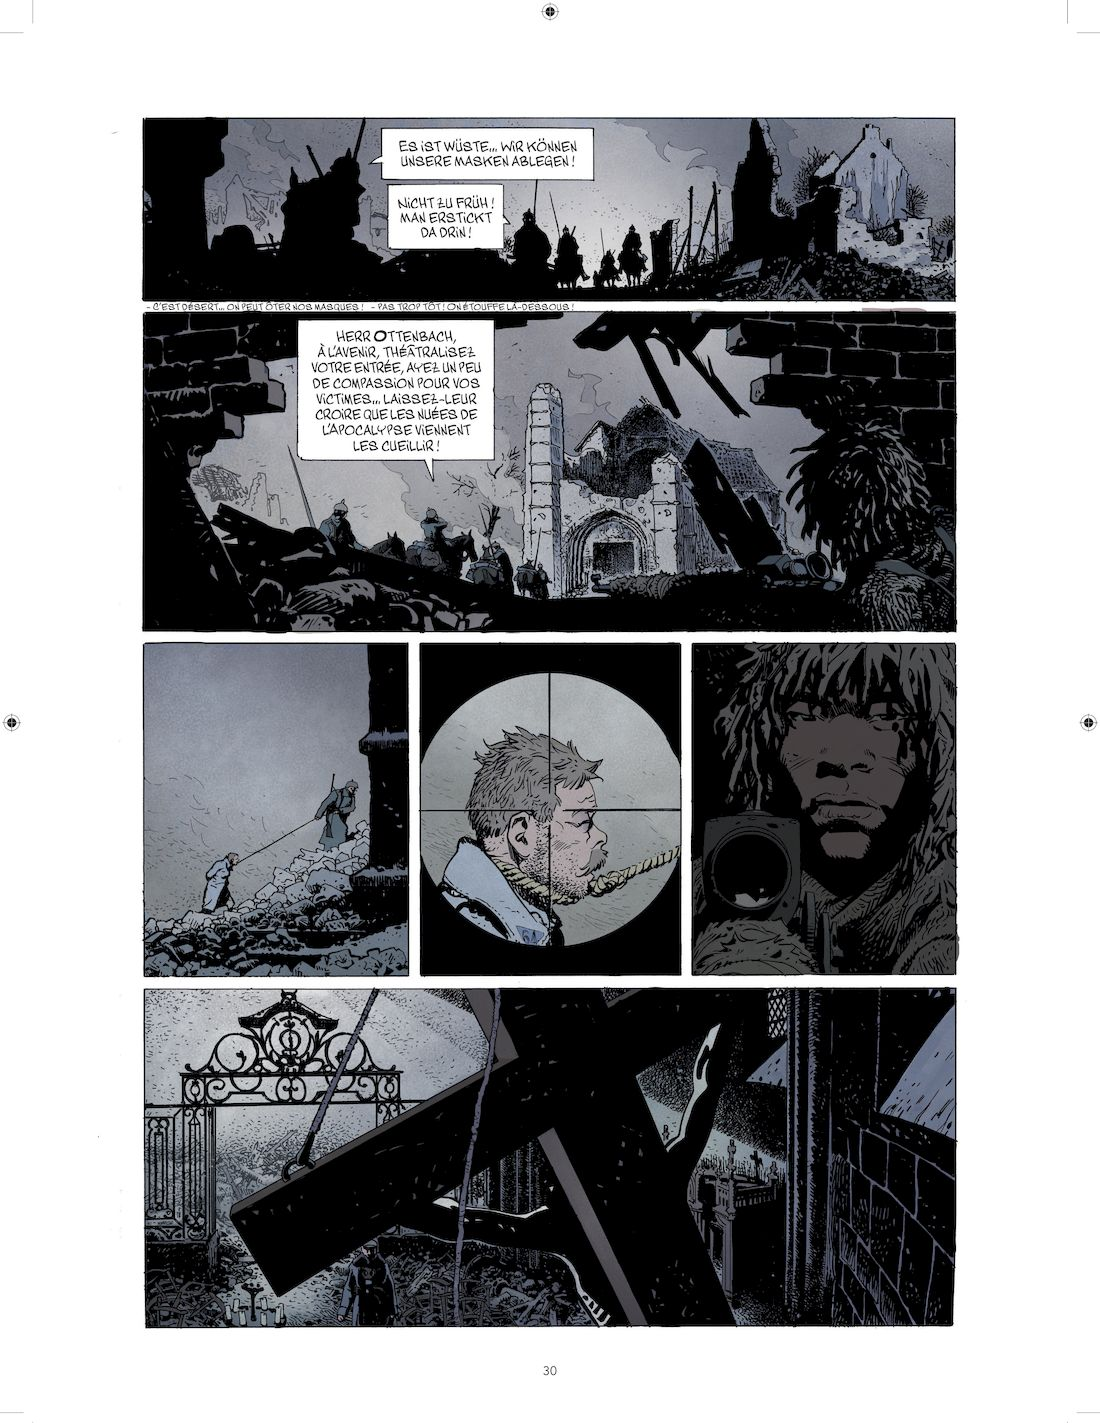 La ballade du soldat Odawaa, version finale de la page 30 © Rossi / Apikian / Walter